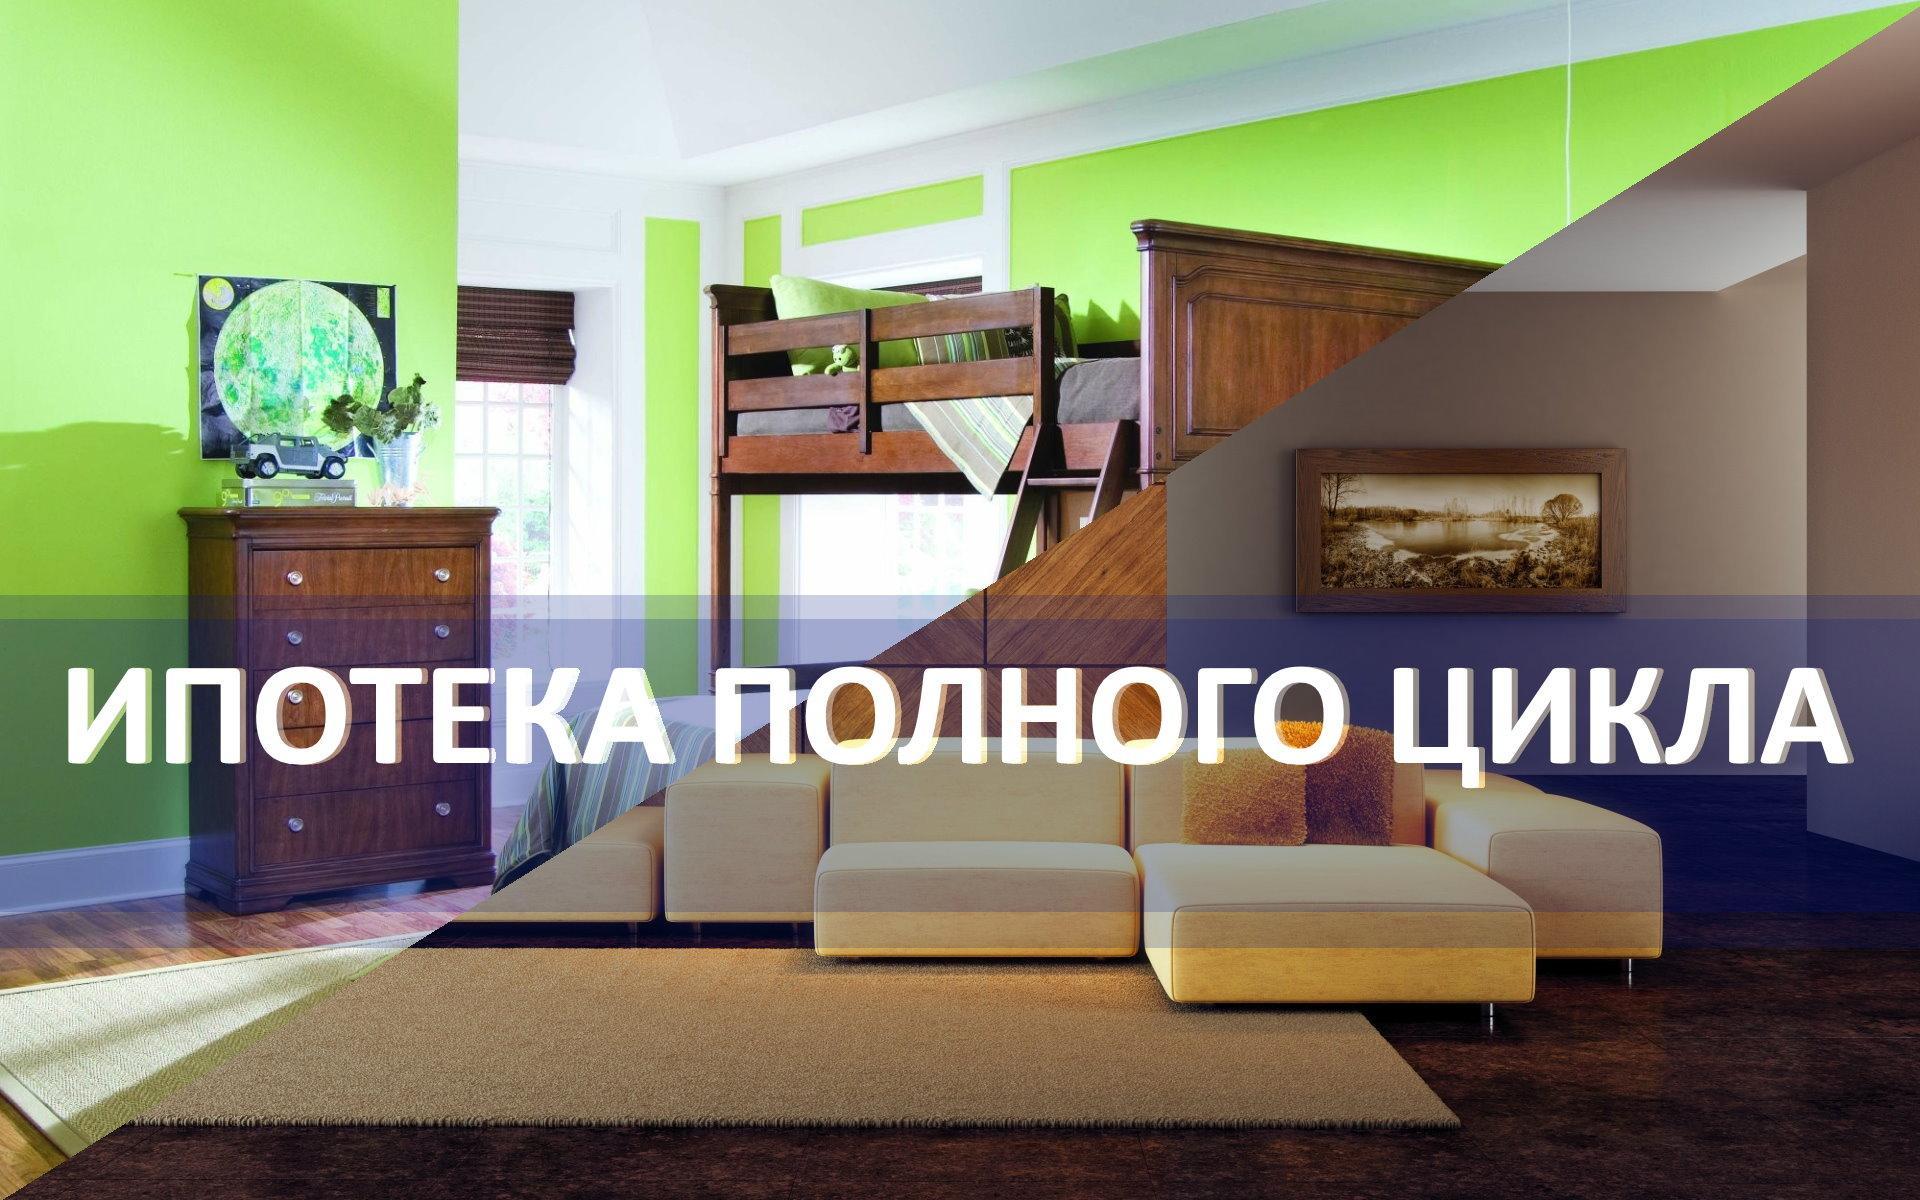 Ипотека банка «ПримСоцБанк»